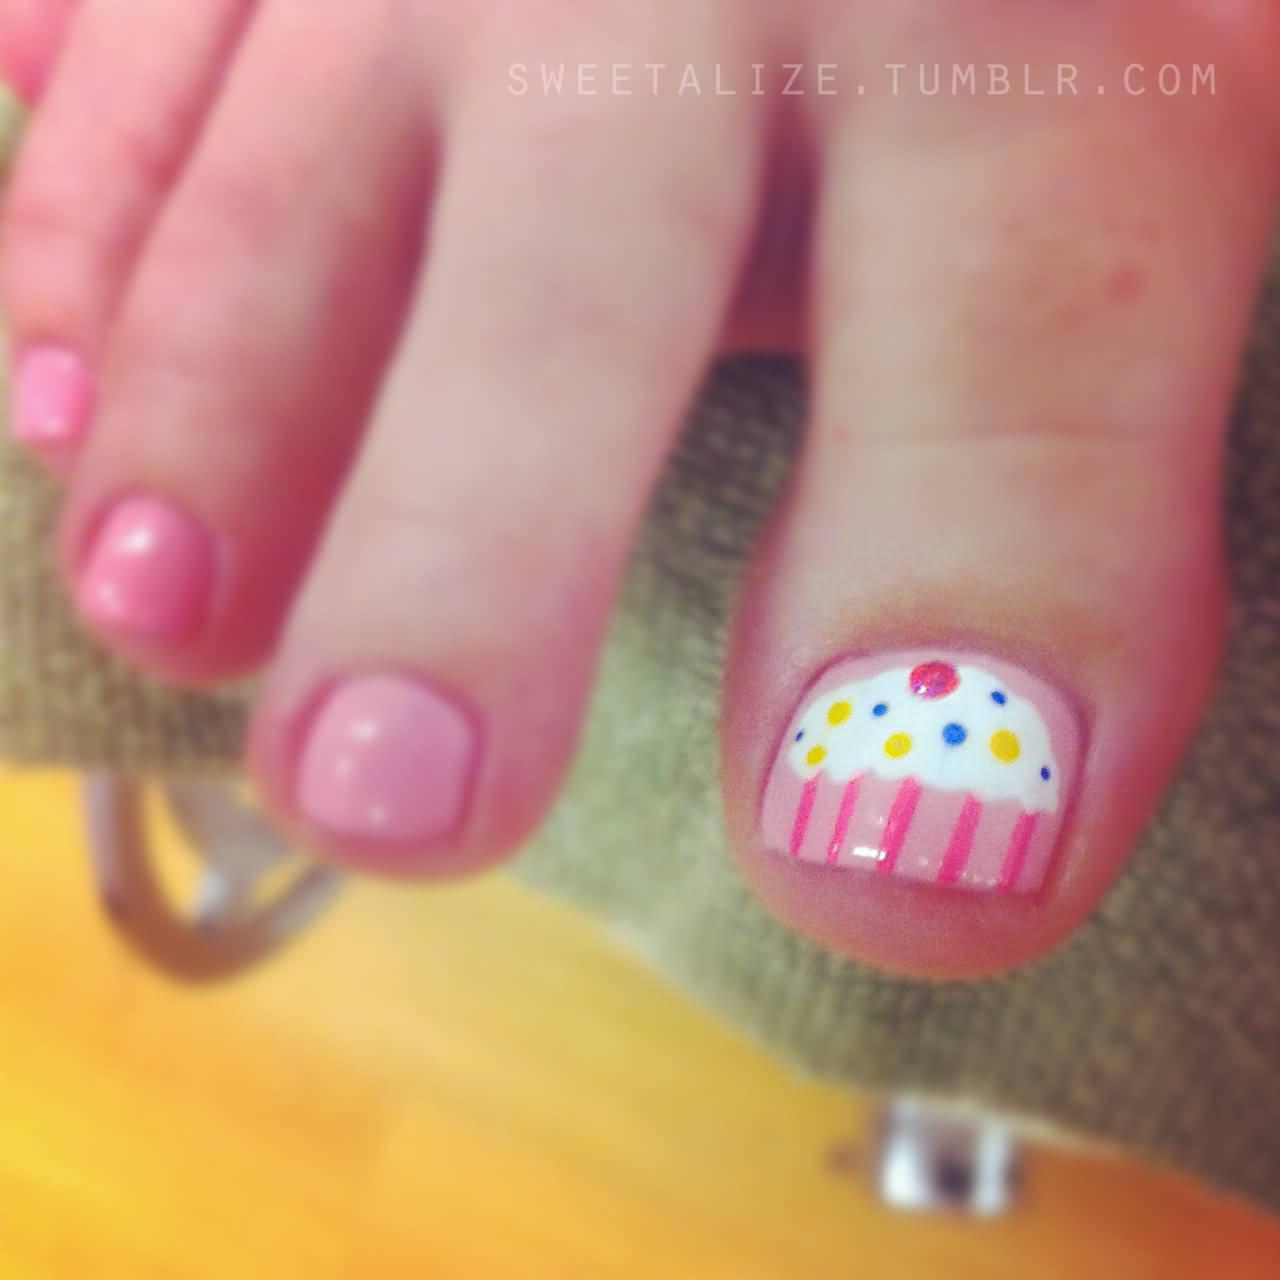 Cute Cupcake Nail Art Design For Toe Nails